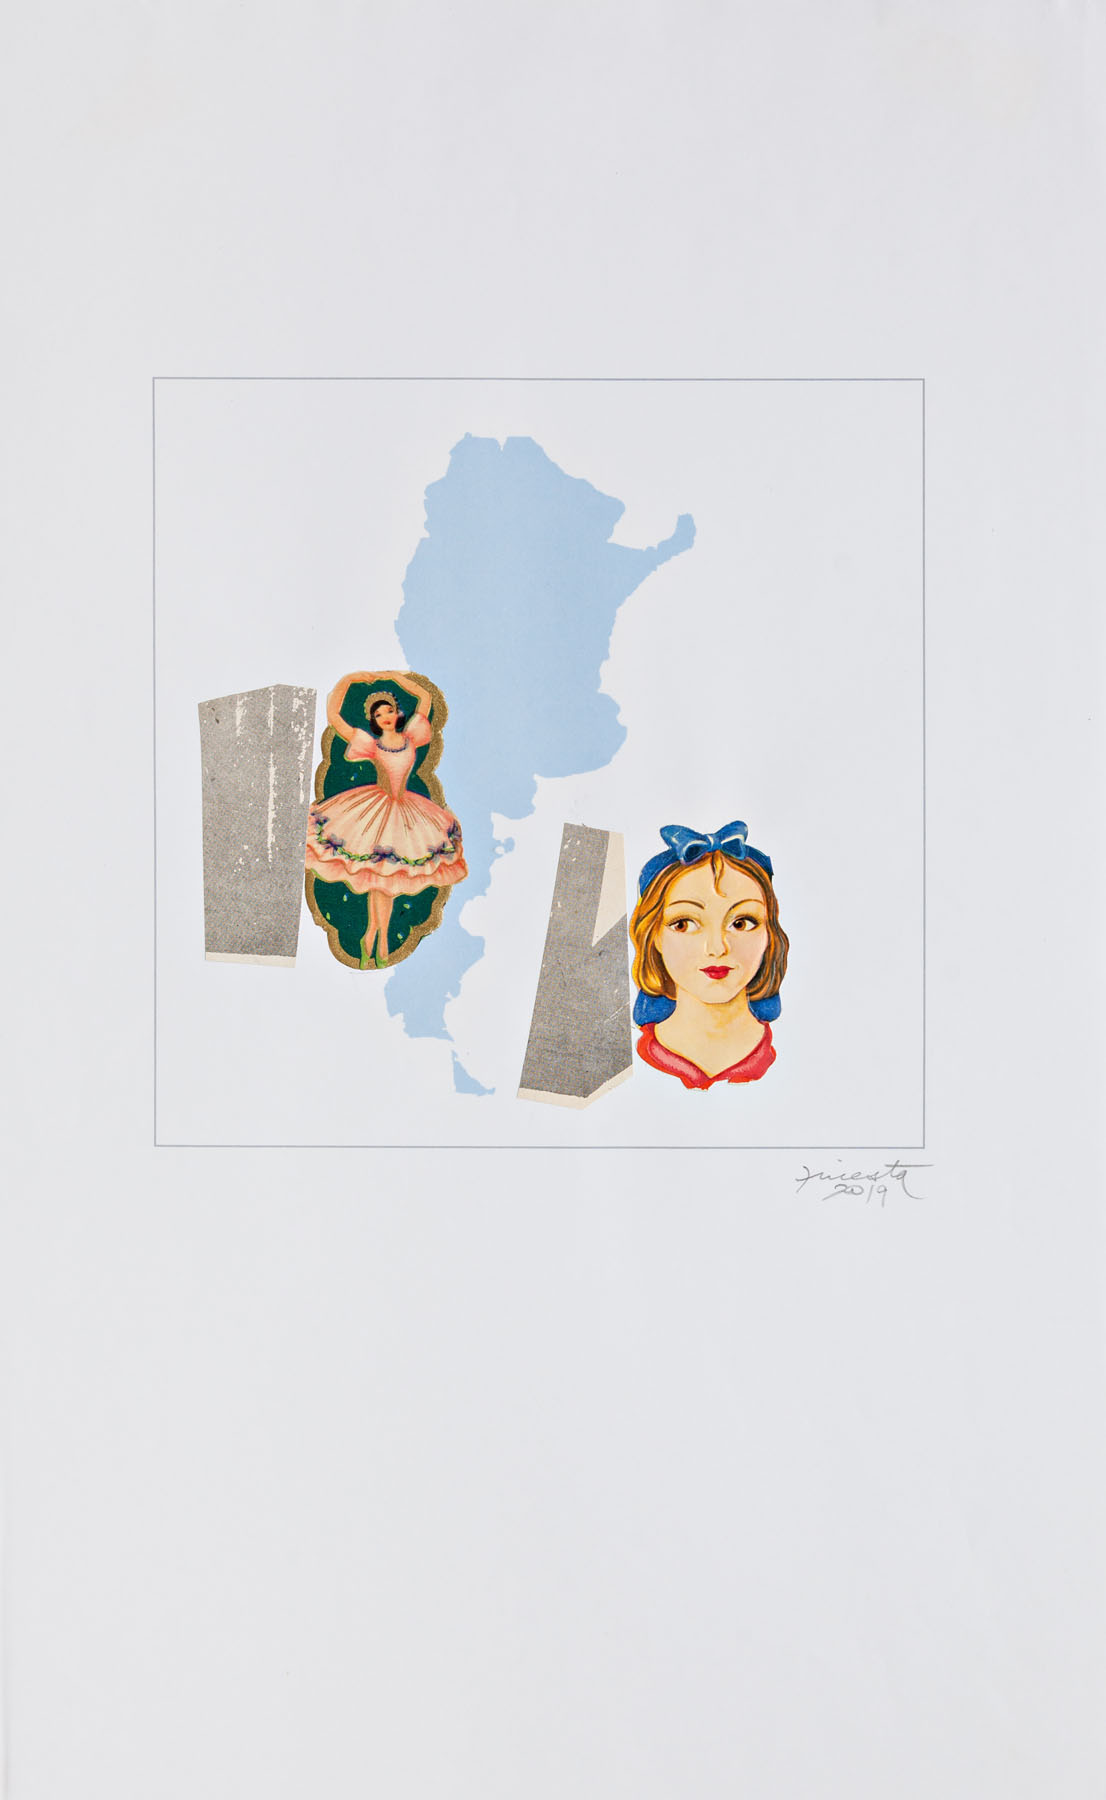 Serie verano, papel collage, 29,7 cm x 19 cm, 2020